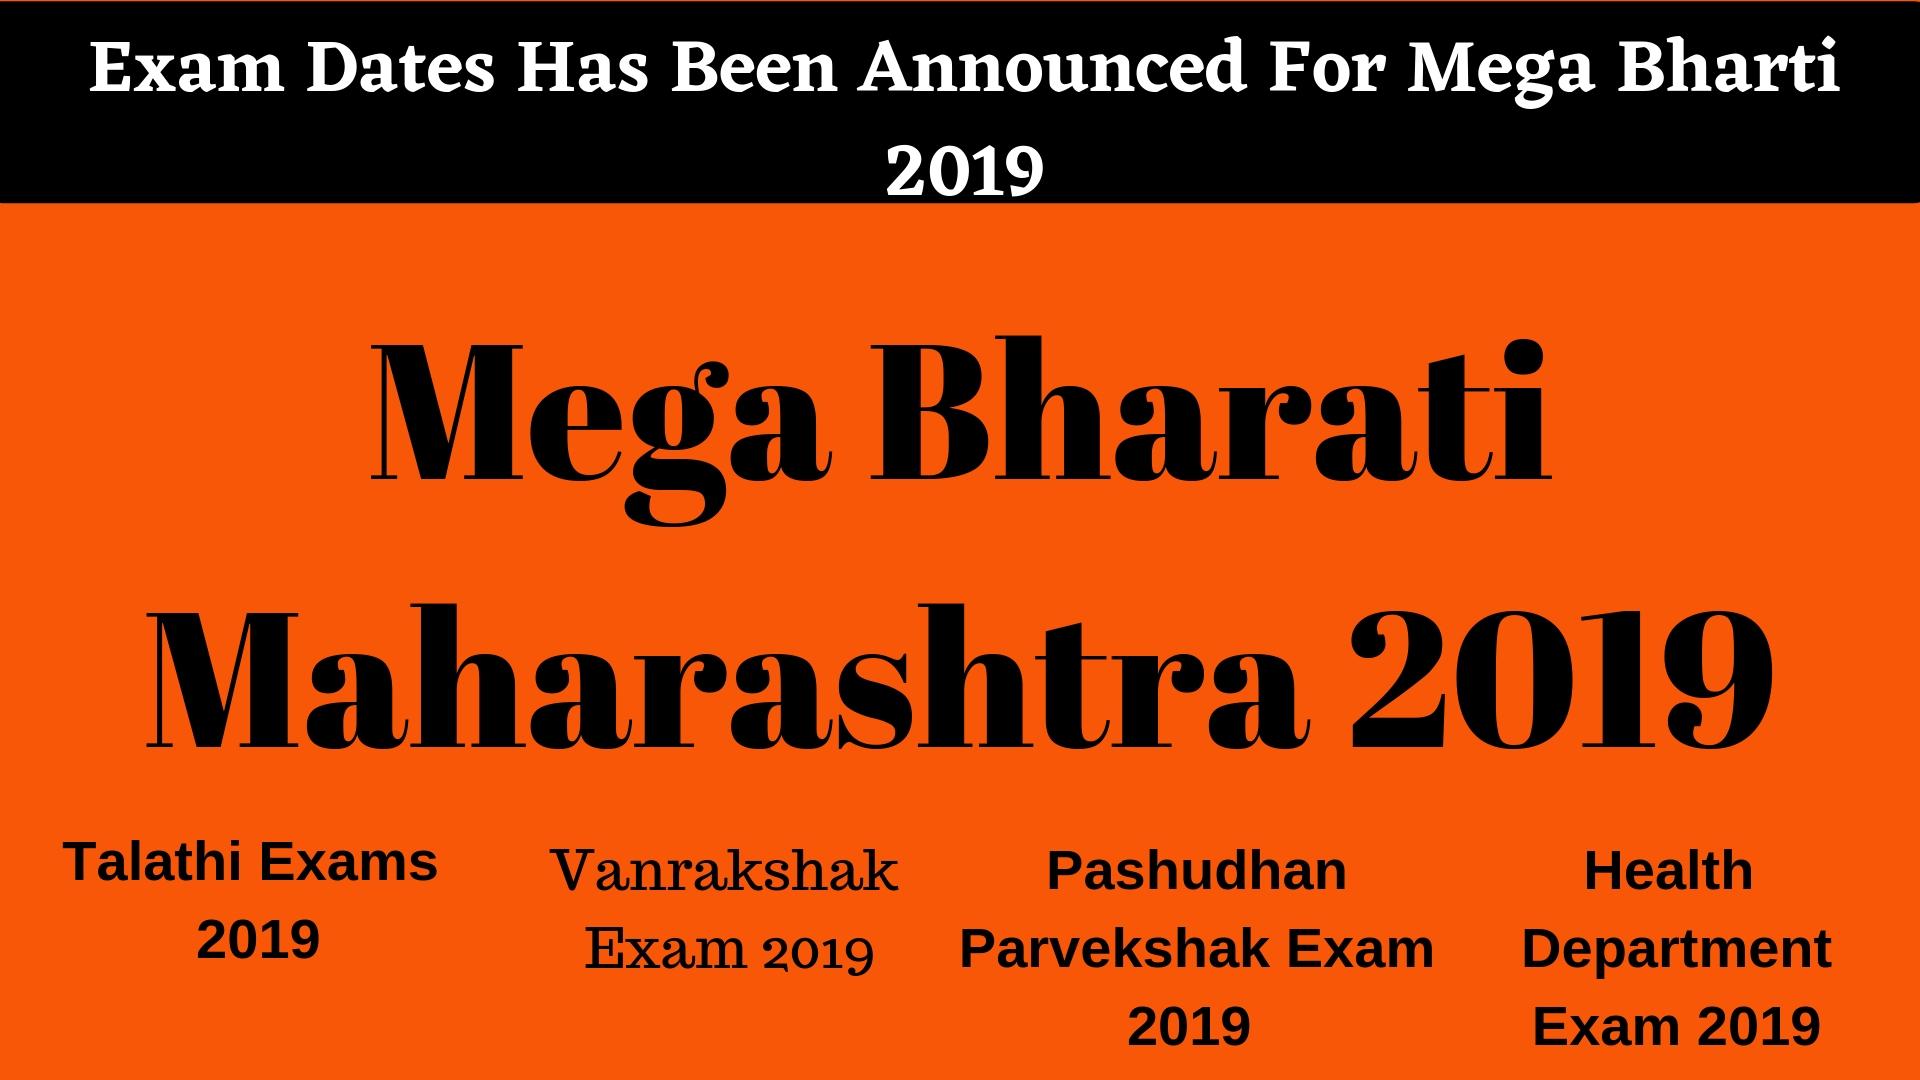 Exam Dates Has Been Announced For Mega Bharti 2019